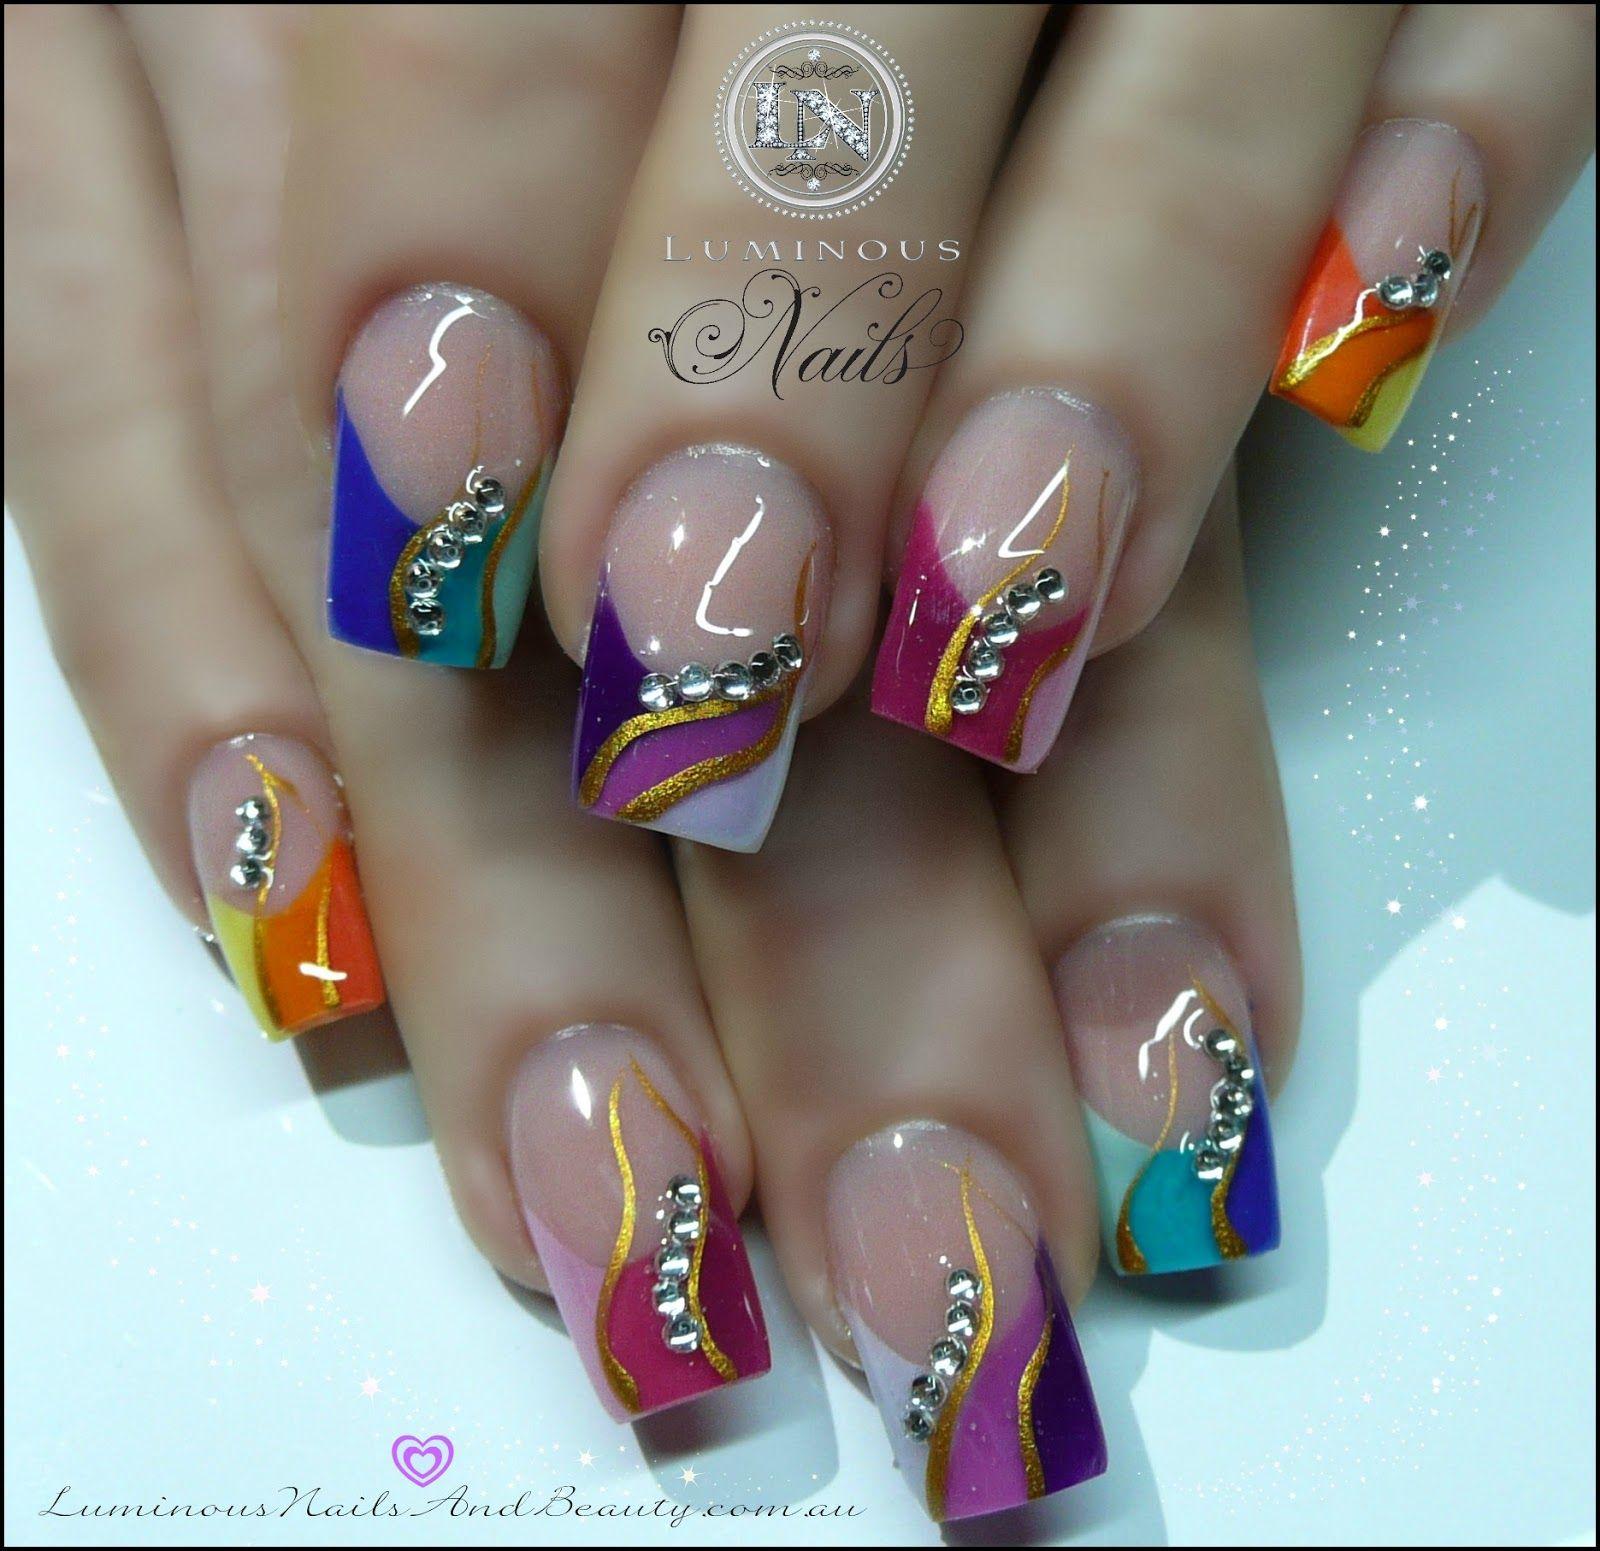 Luminous Nails | Nail Art | Pinterest | Luminous nails, Toe nail ...